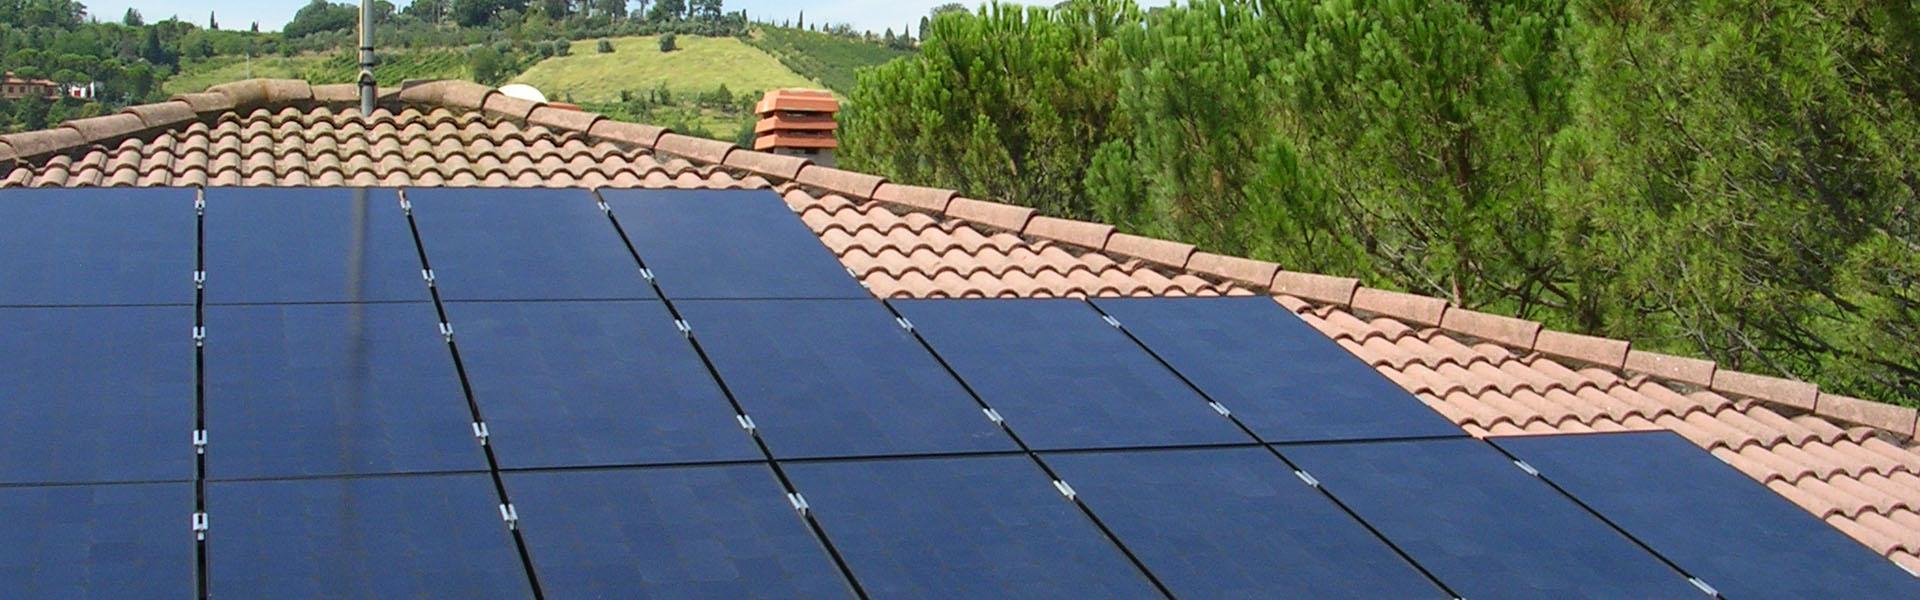 pannelli-fotovoltaici-faenza-banner